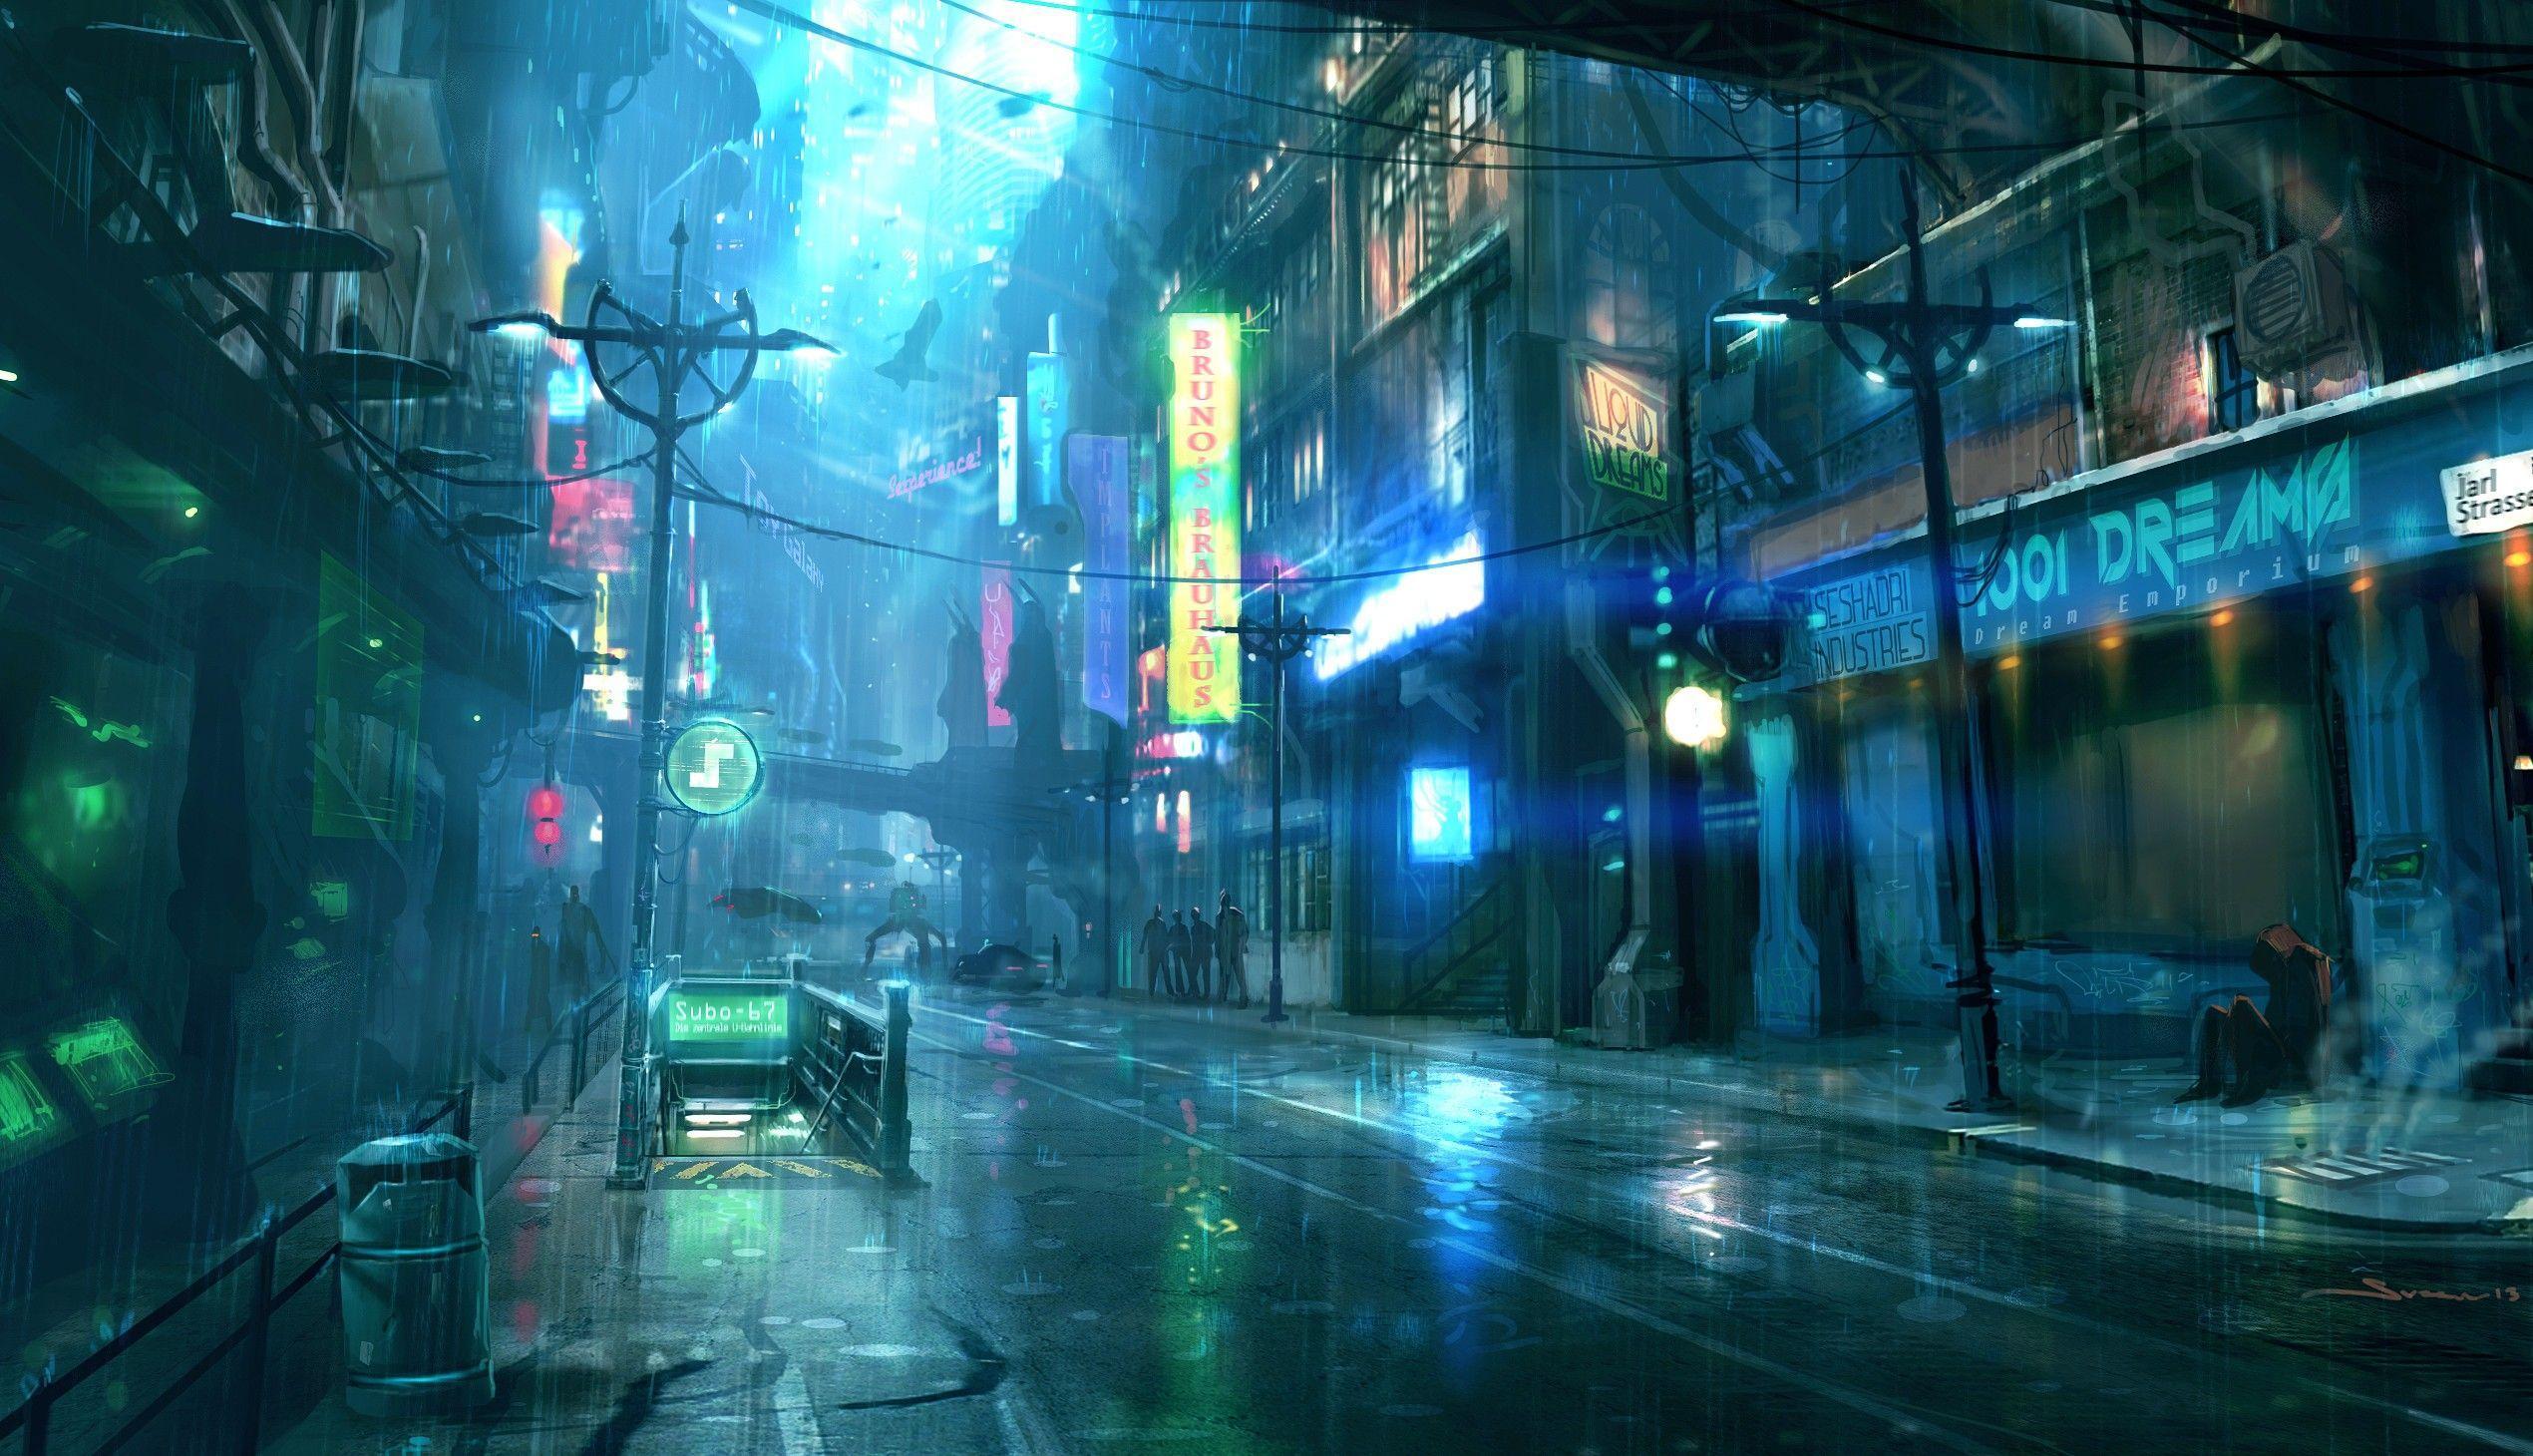 Rain Anime Wallpapers Top Free Rain Anime Backgrounds Wallpaperaccess